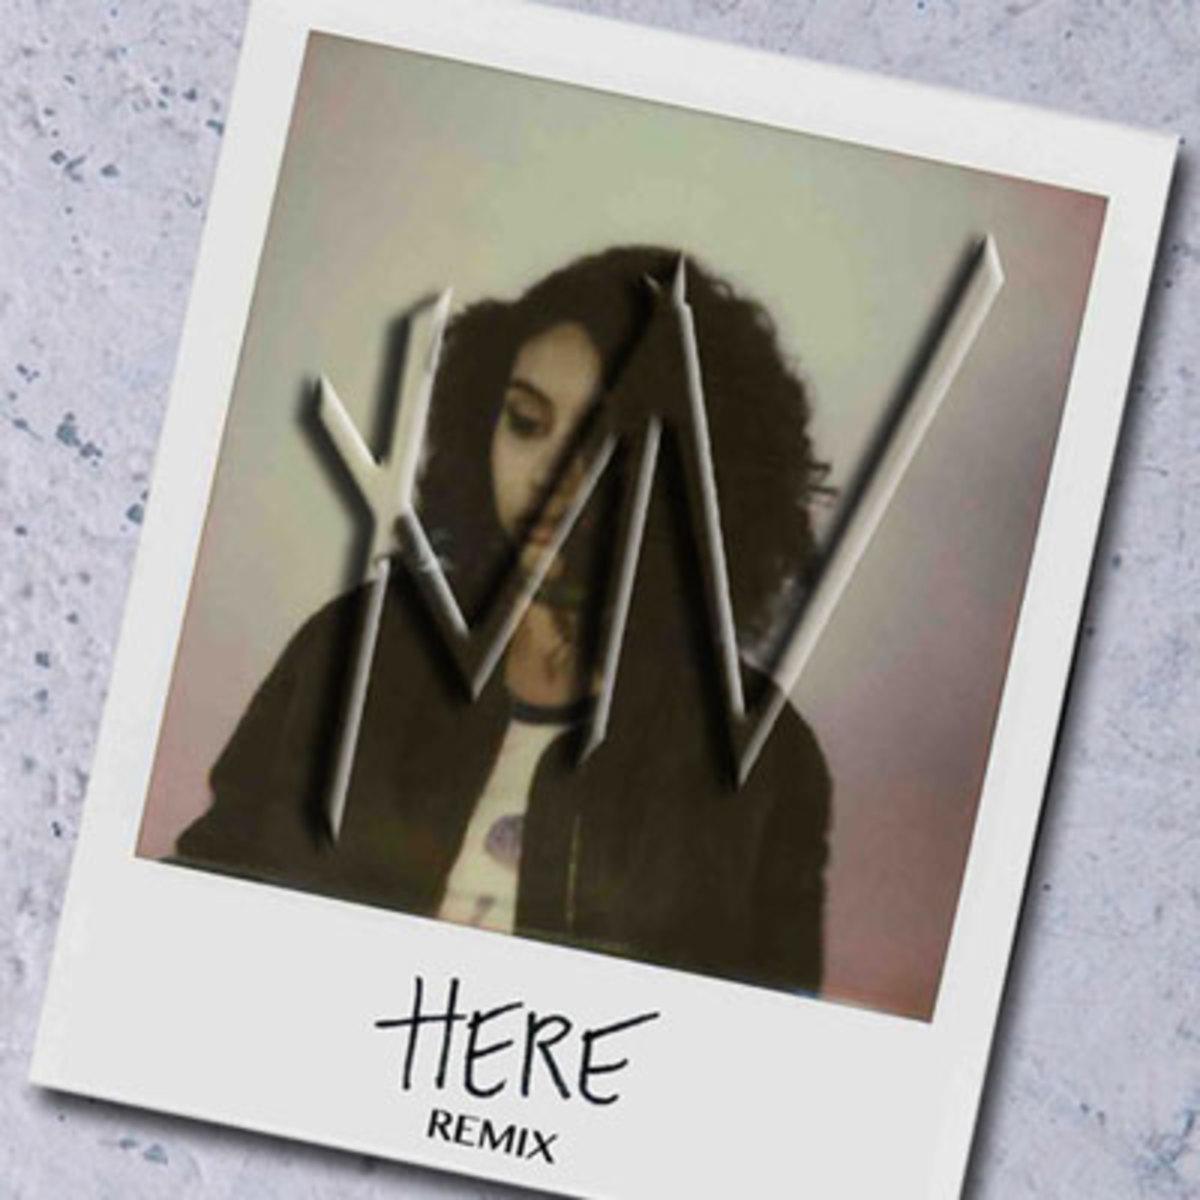 alessia-cara-here-mv-remix.jpg